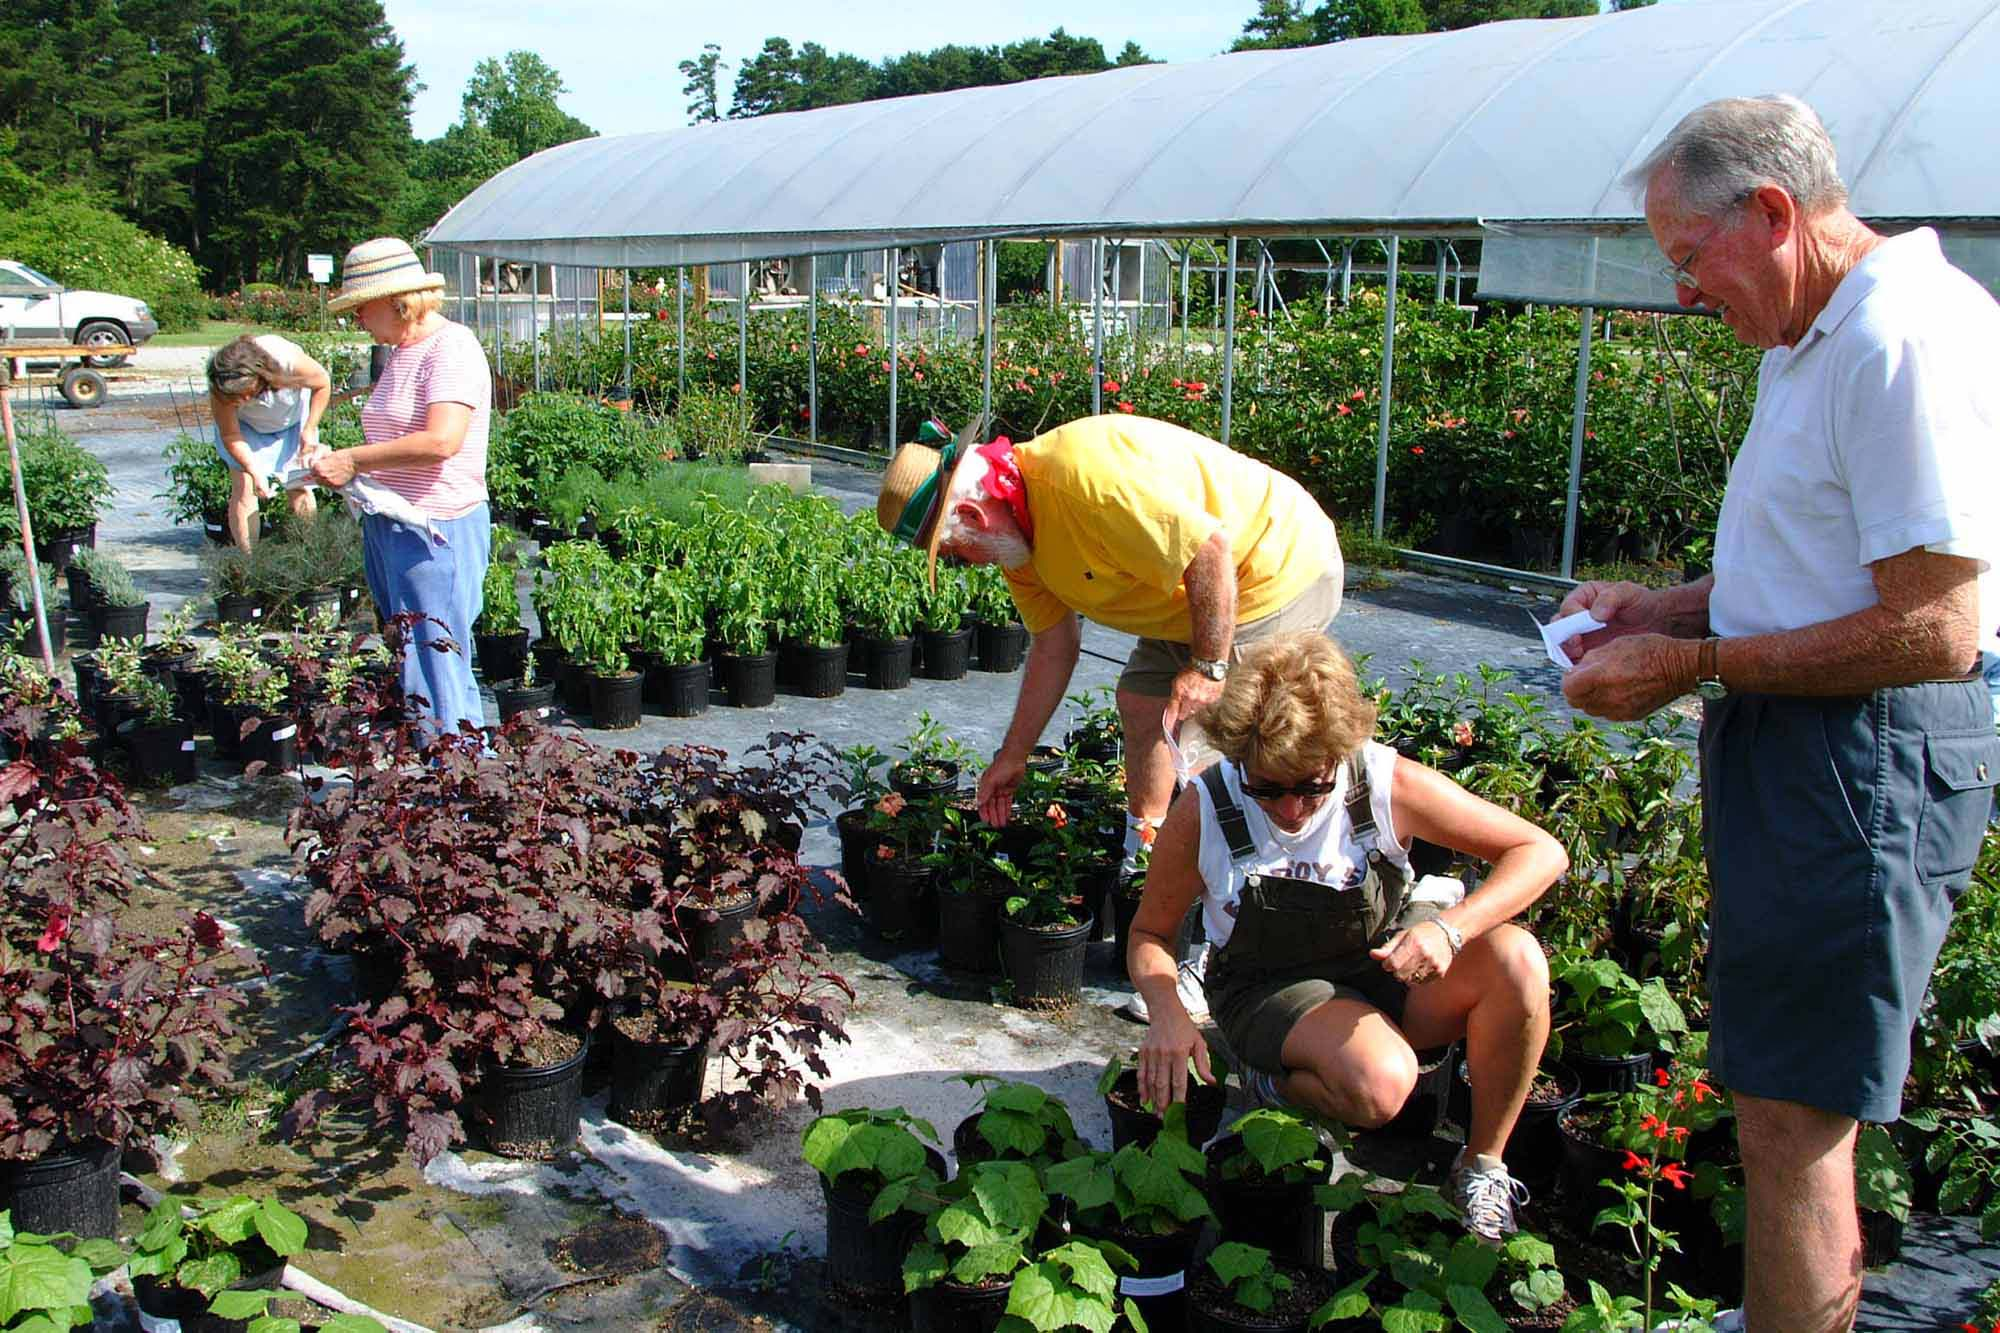 Make Friends By Growing A Garden - Stitch